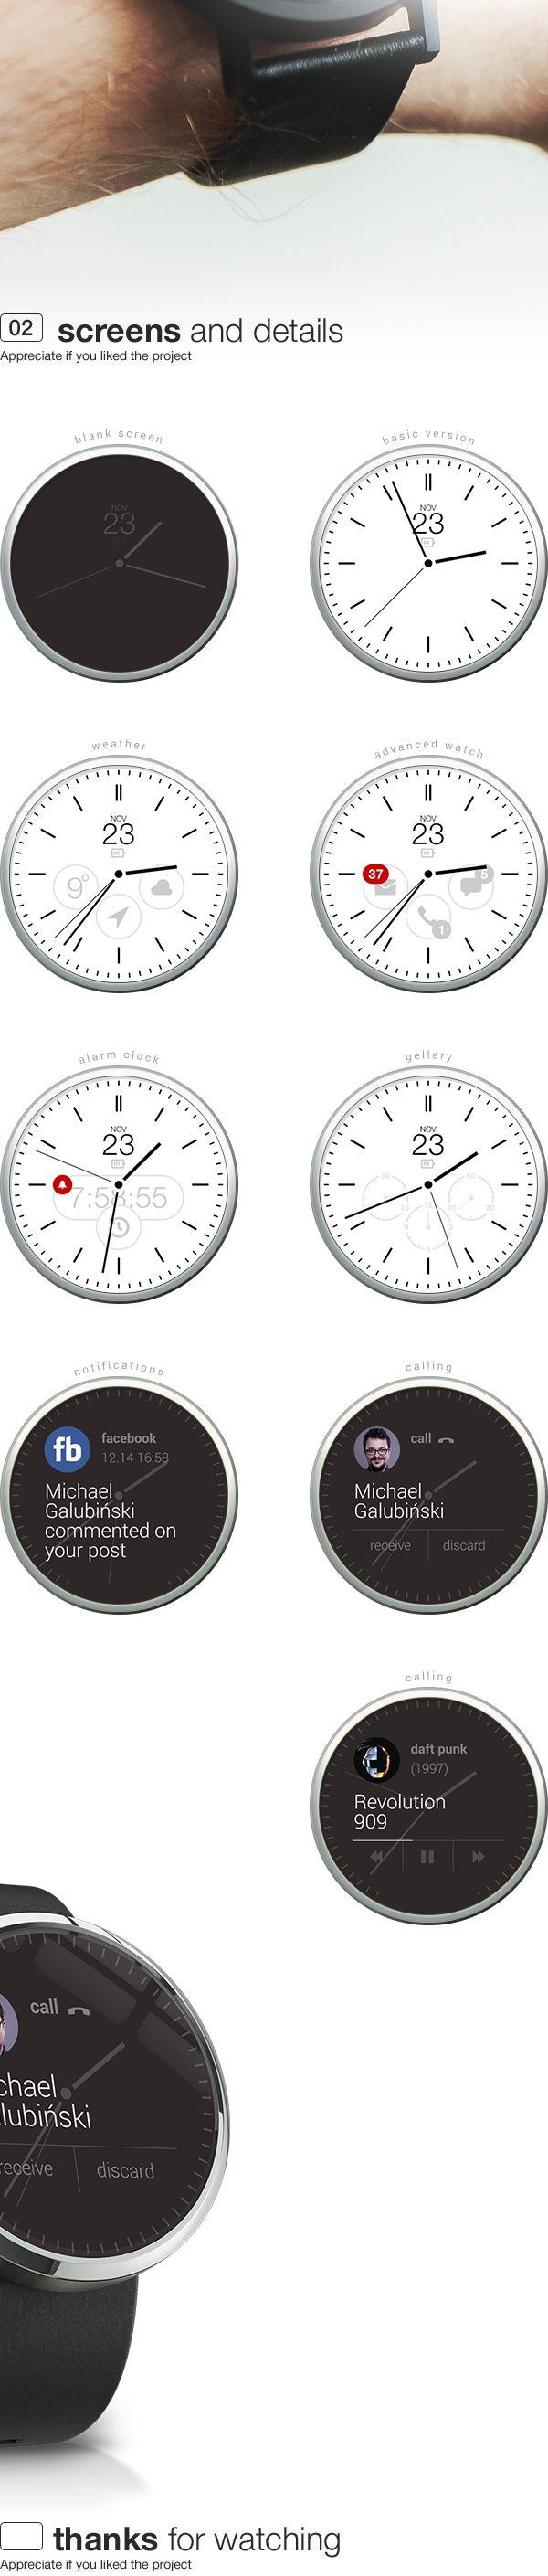 android wear concept watch app on Behance #wearable #smart #watch #mobile #ui #ux #design via http://pinterest.com/alextcsung/